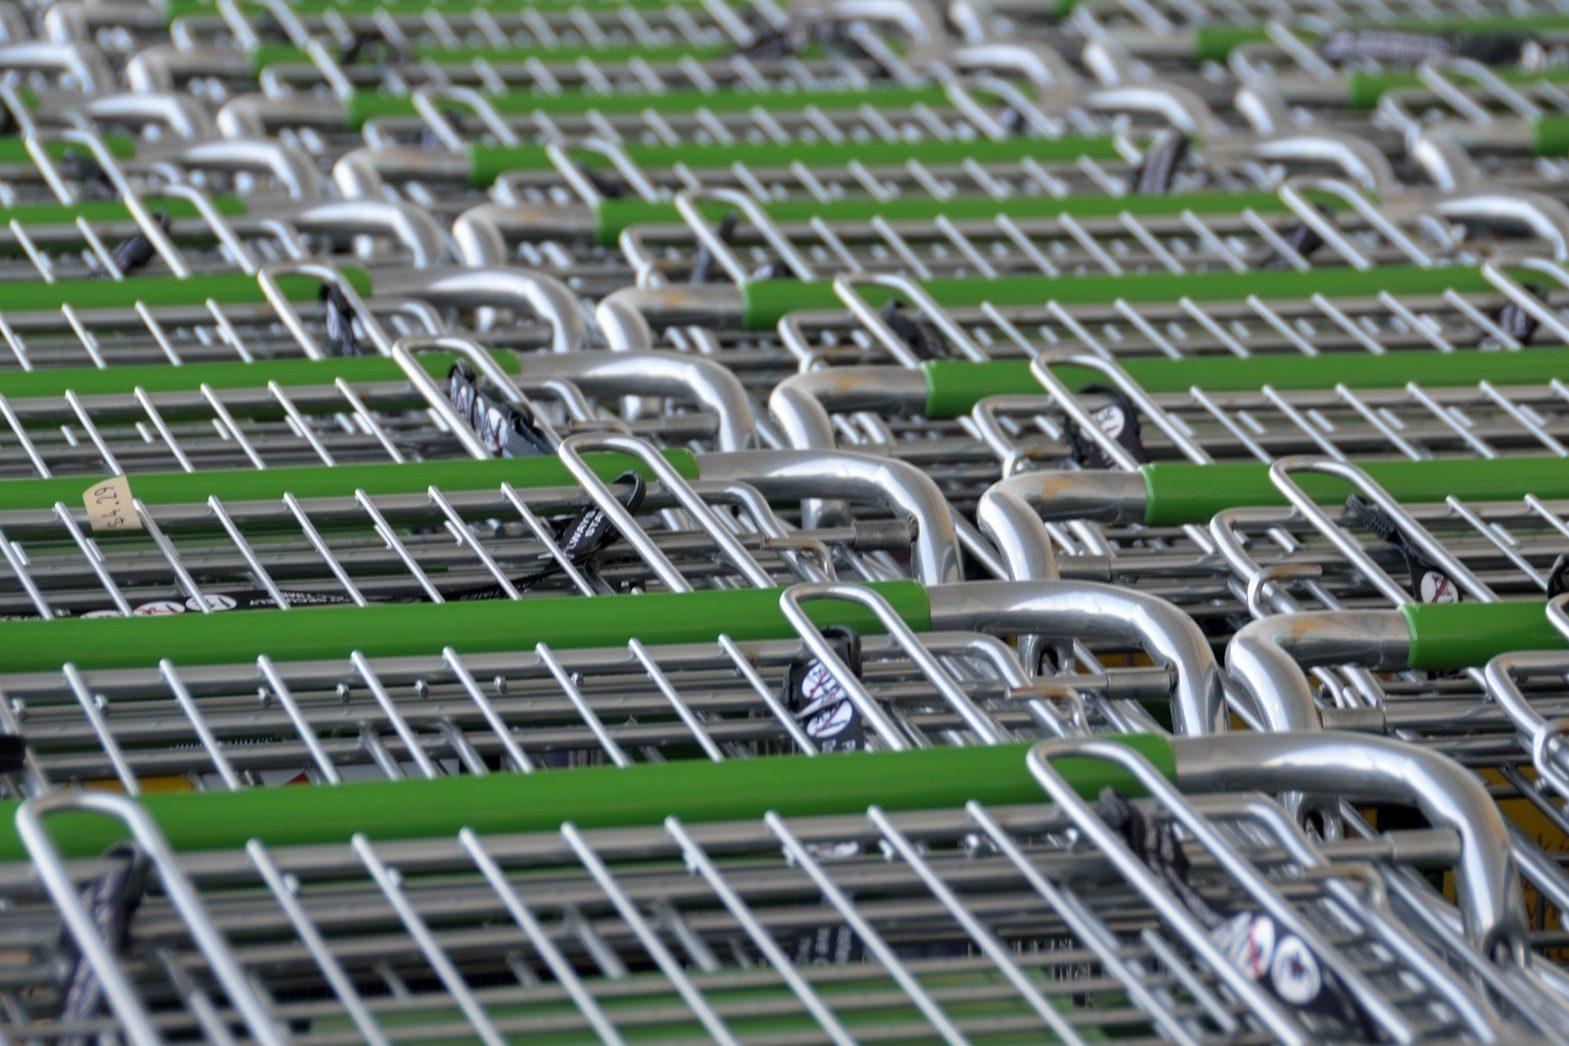 Shopping supermarket trolleys